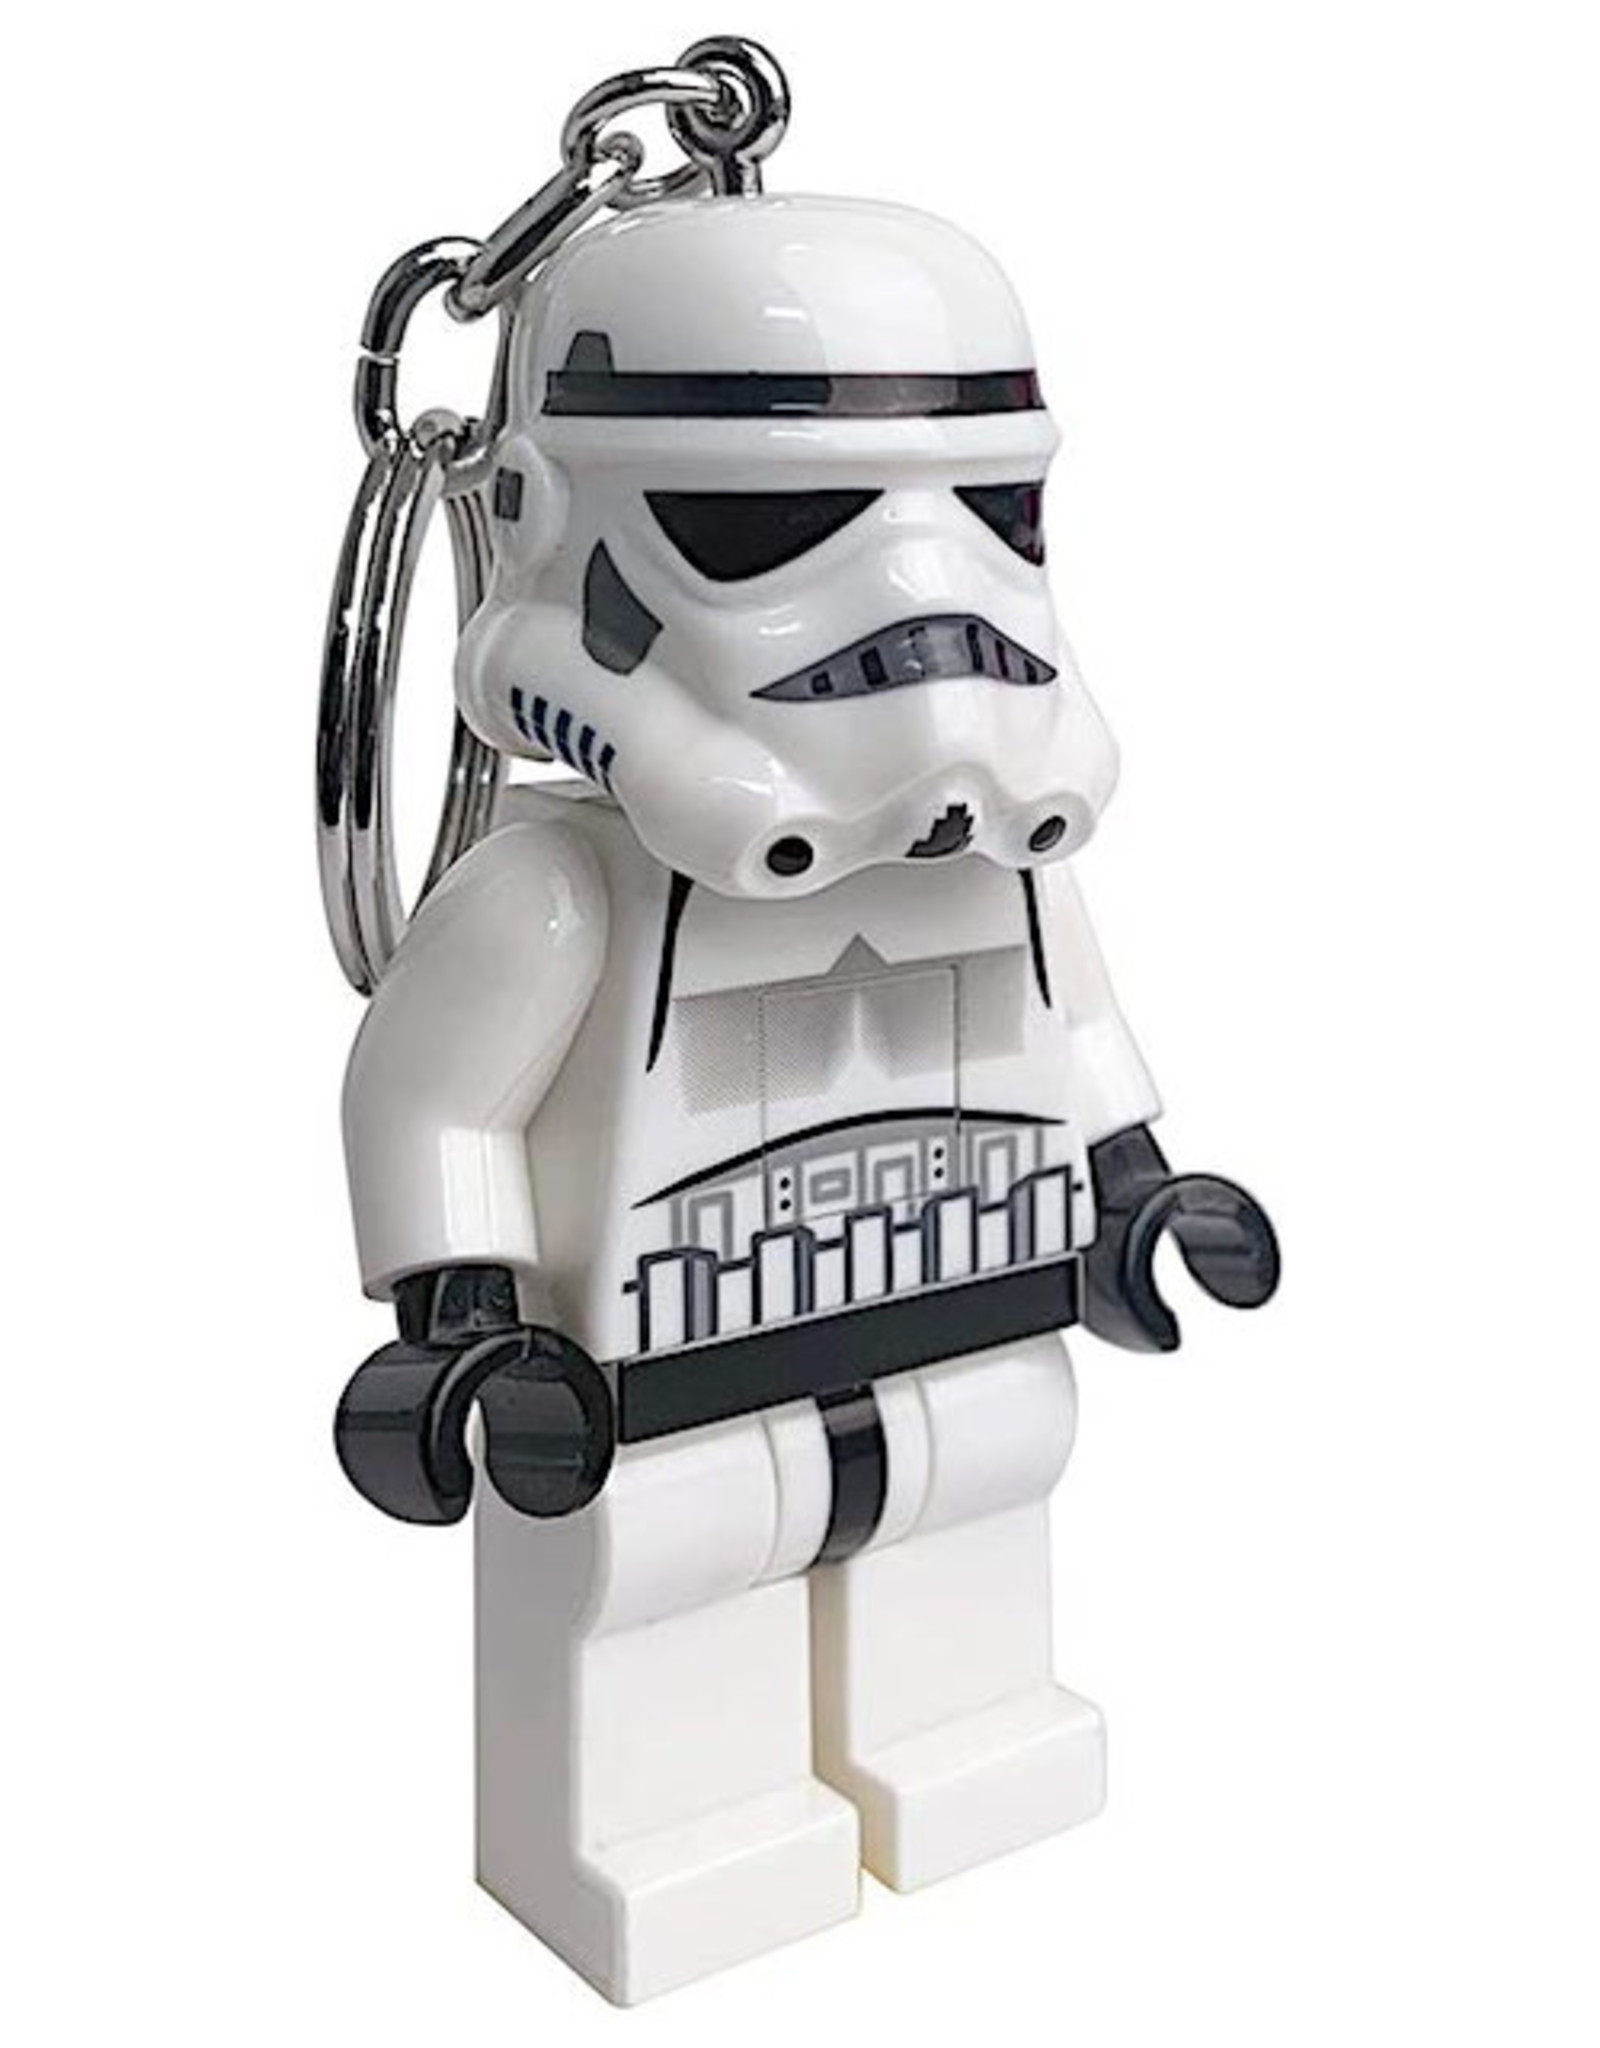 Lego Lego Star Wars Stormtrooper Key Light